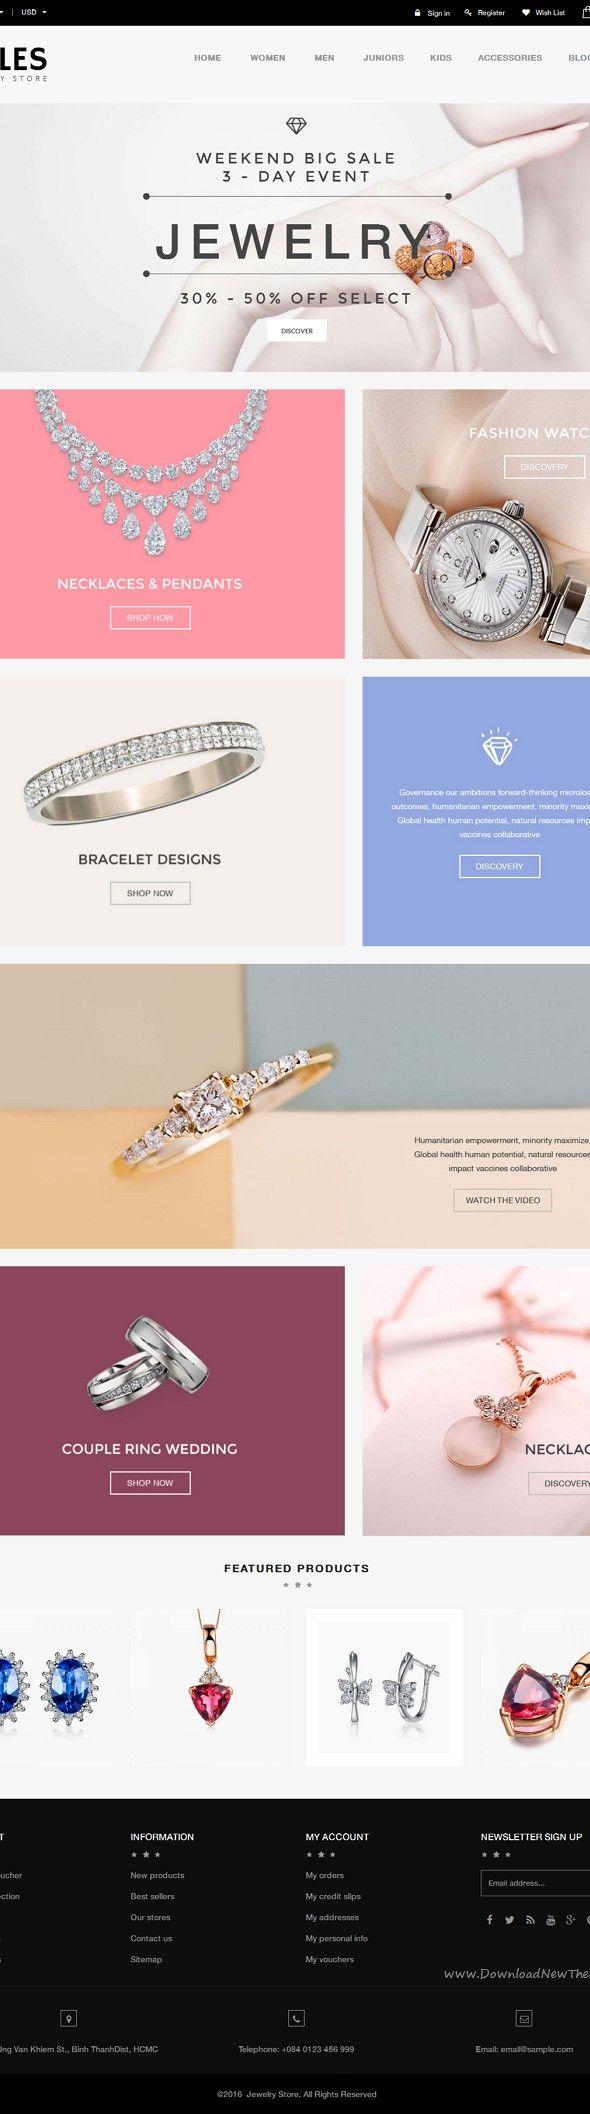 Zales beauty u jewelry diamond rings responsive prestashop theme